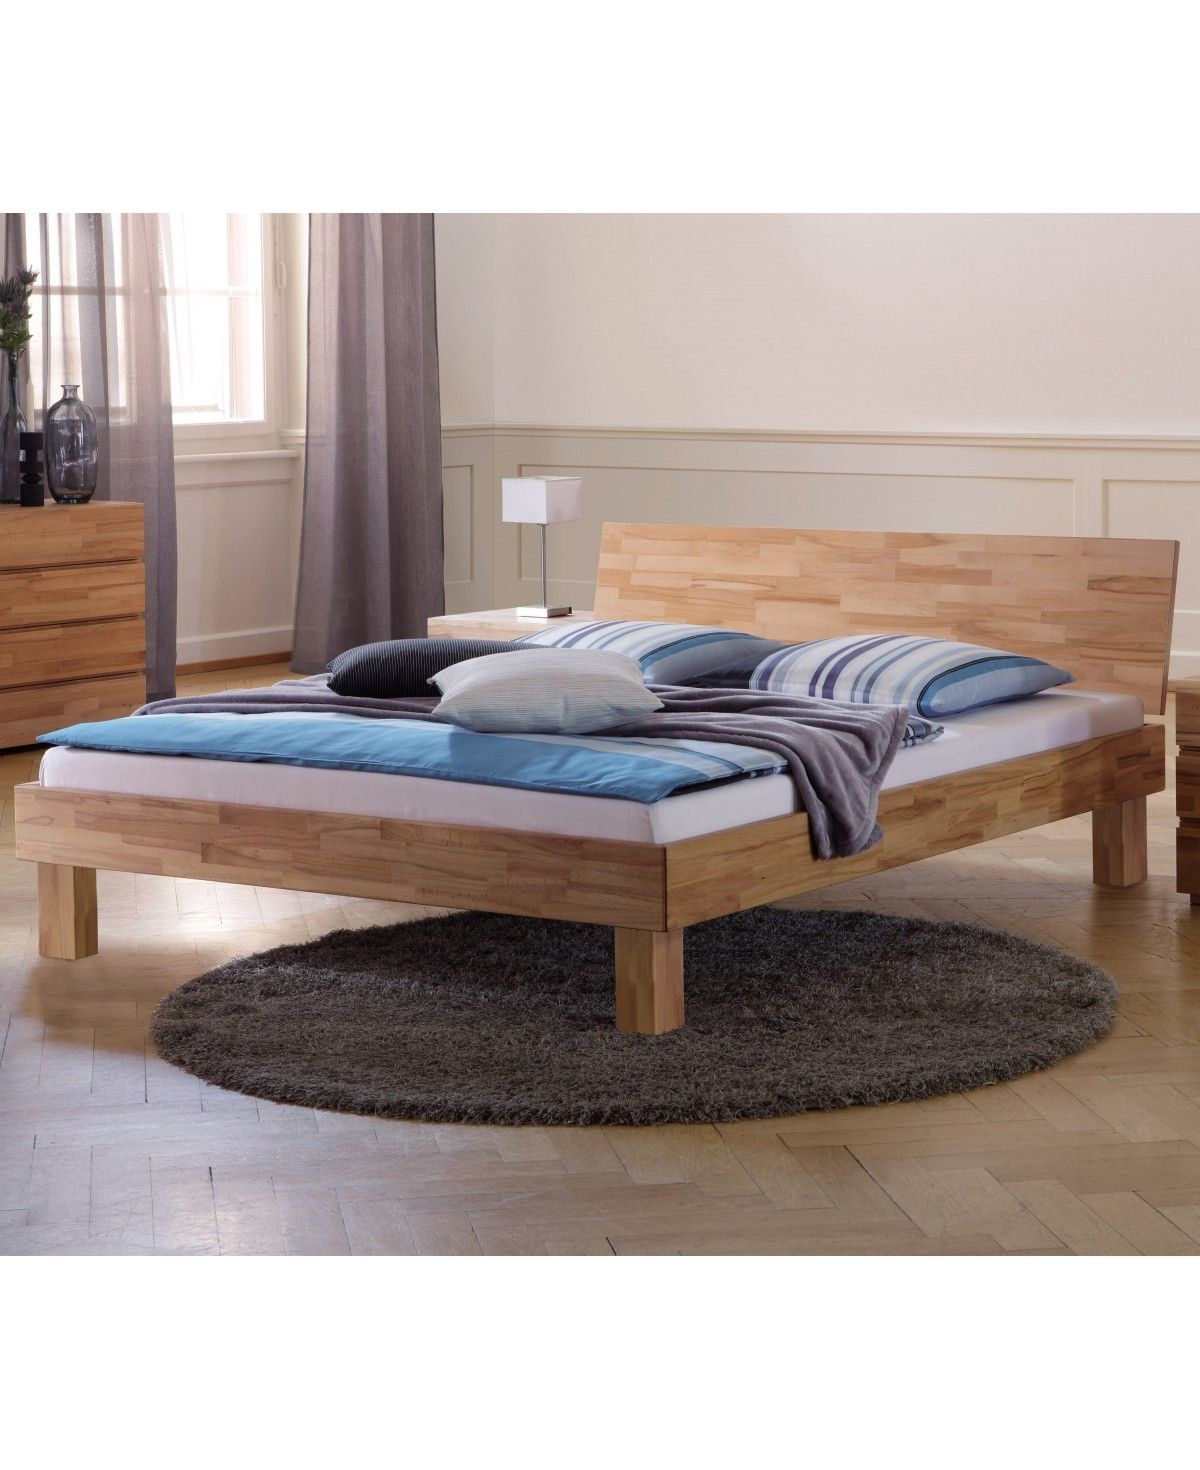 Hasena Wood Line Bett Kernbuche Kopfteil Varus Füße Cantu 20 200x220